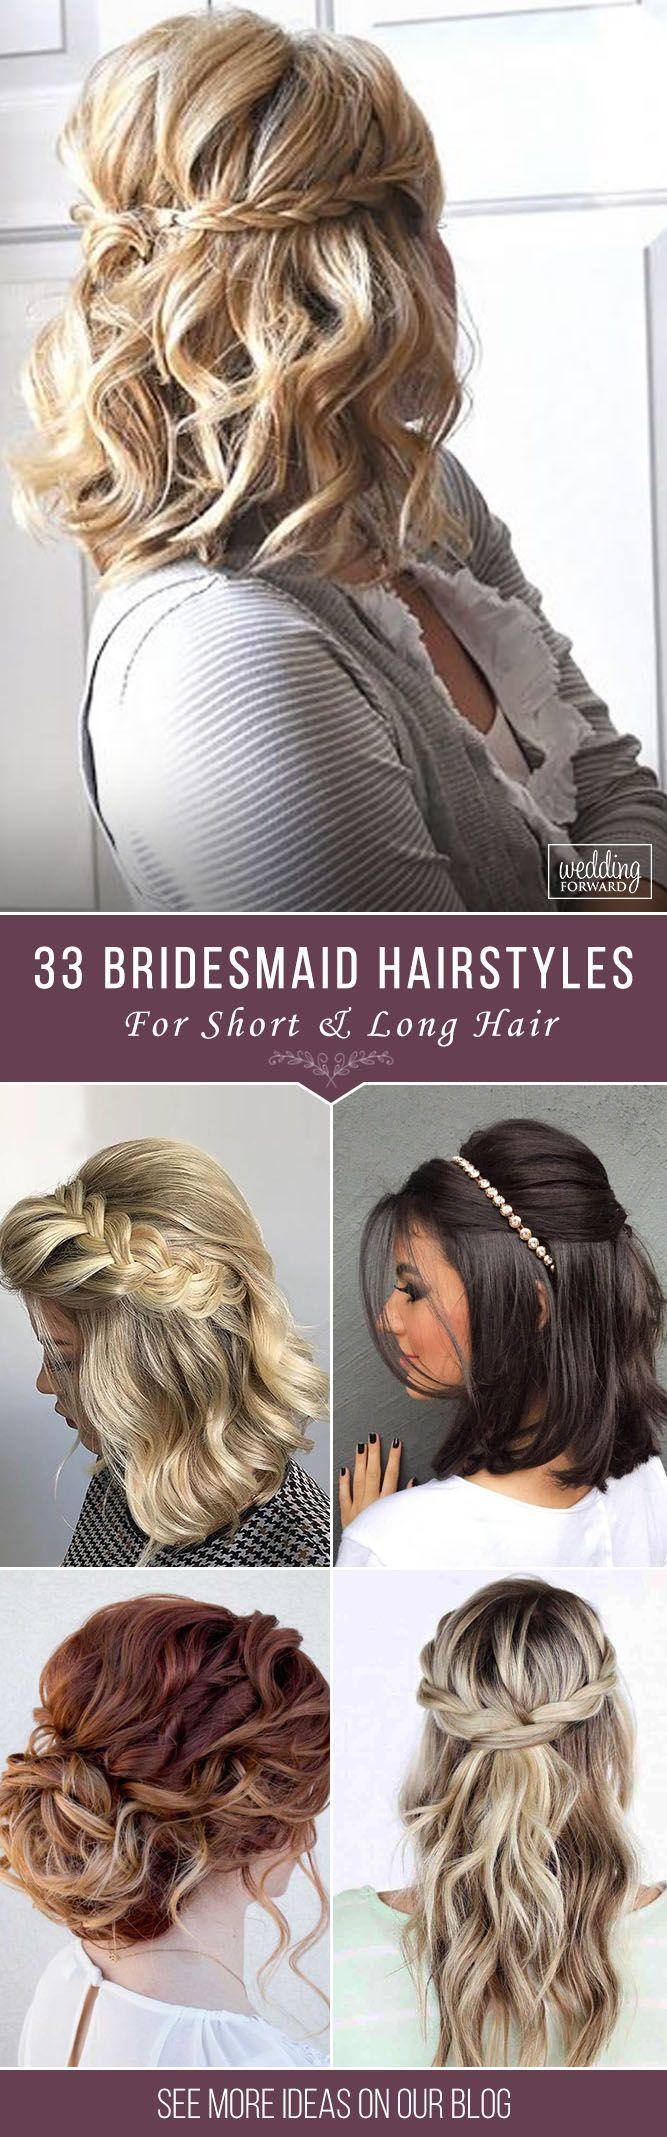 33 Hottest Bridesmaids Hairstyles For Short & Long Hair #braut #BrautFrisuren